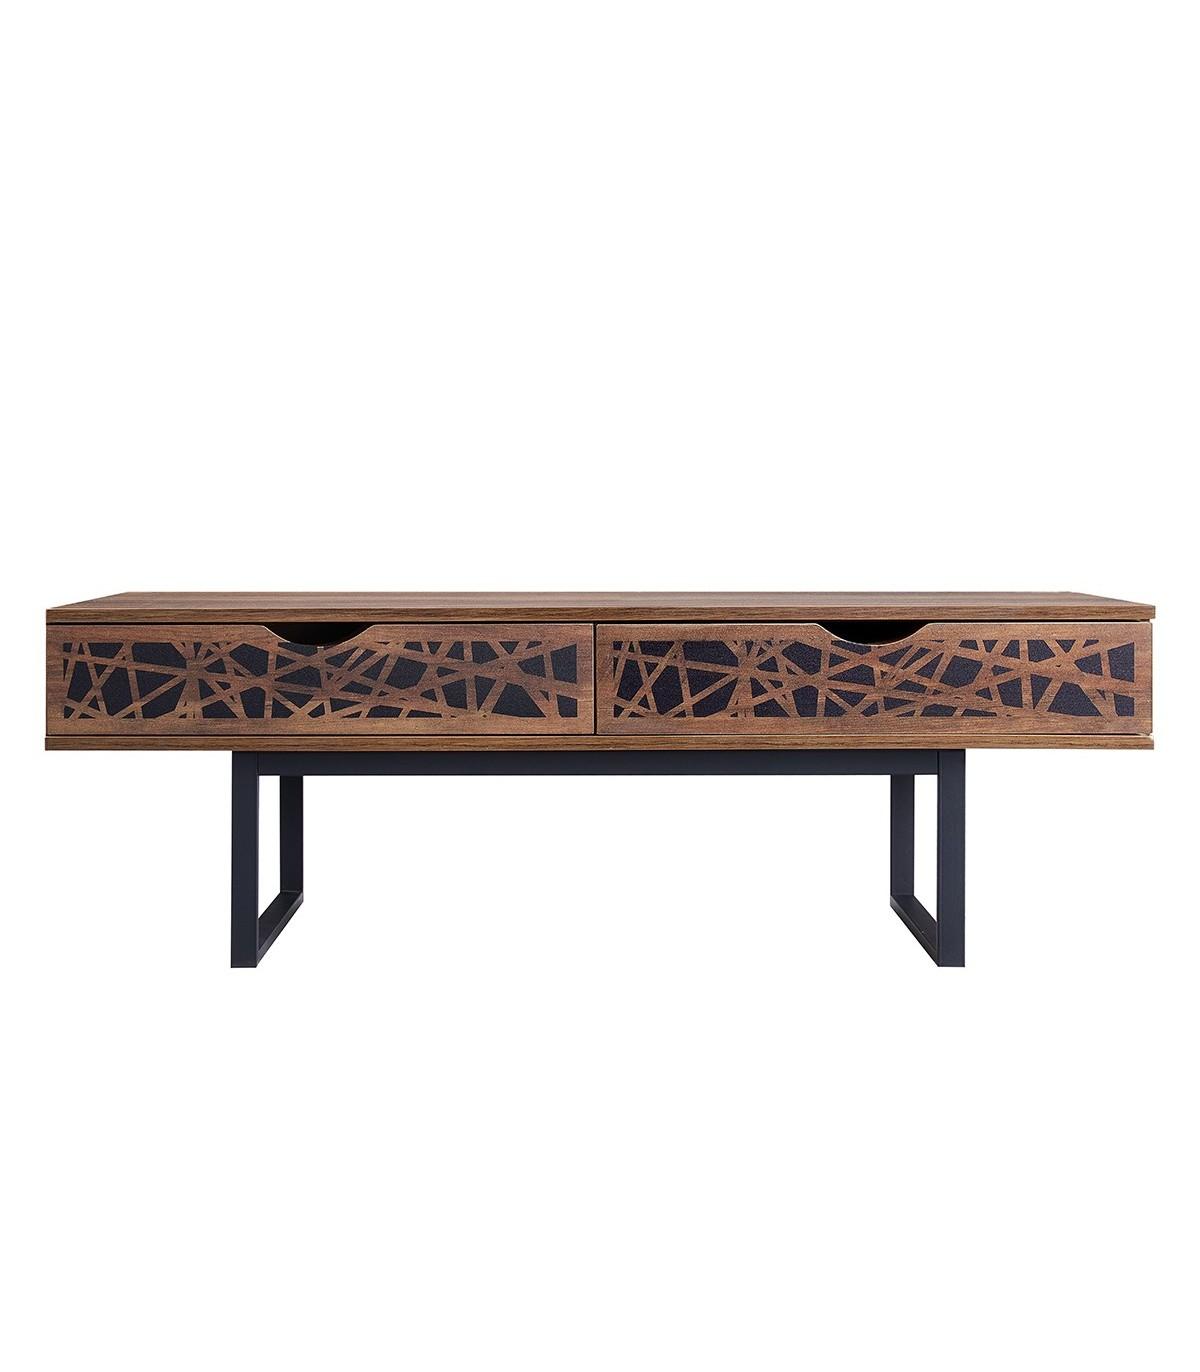 Table basse avec 2 tiroirs L120cm - Marron